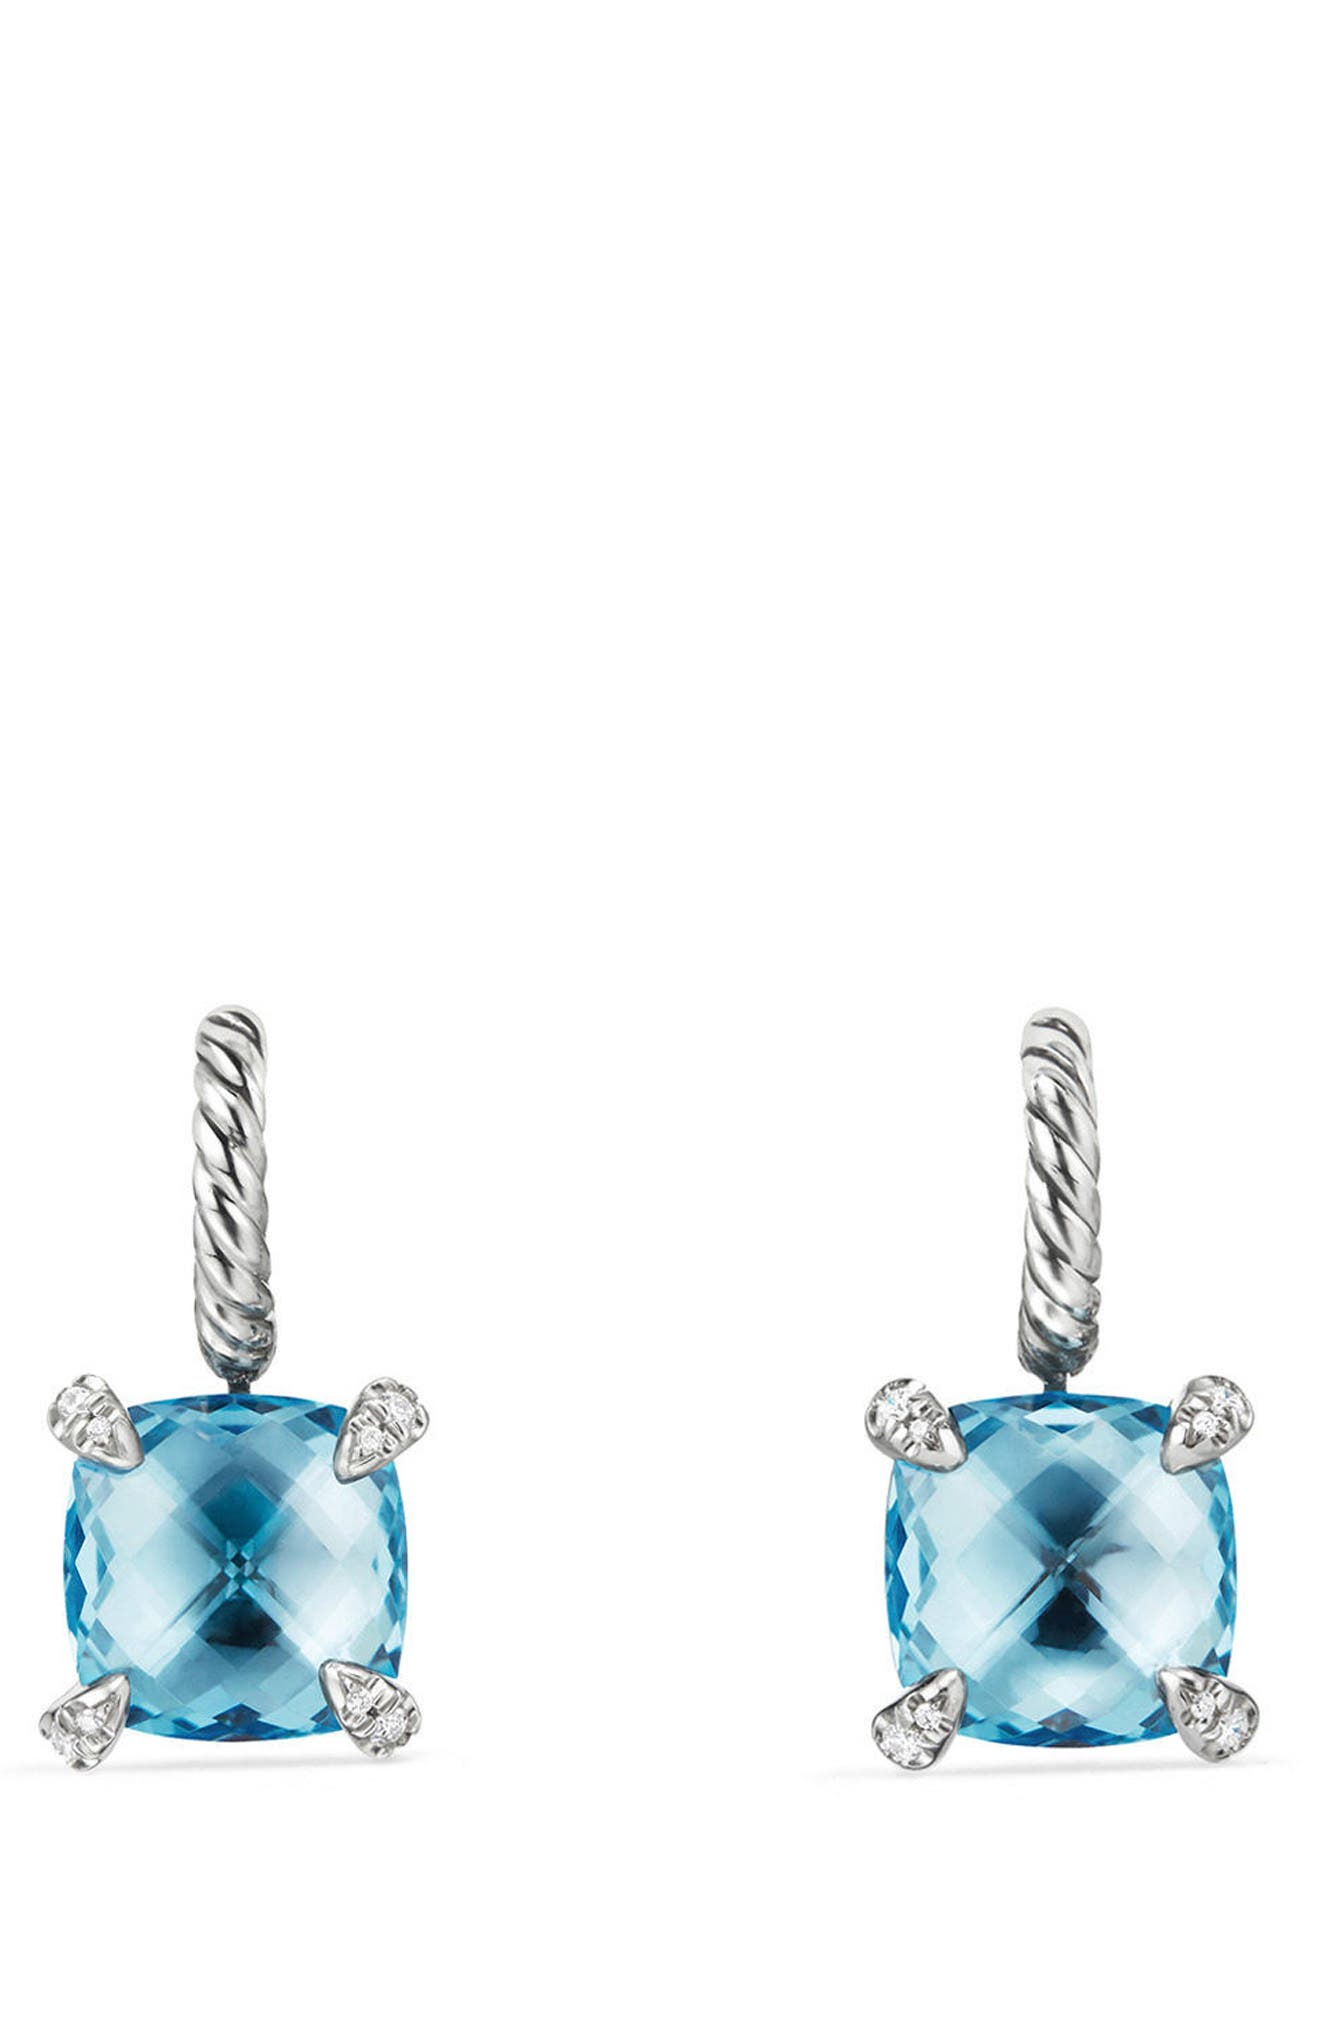 Alternate Image 1 Selected - David Yurman Châtelaine Drop Earrings with Diamonds